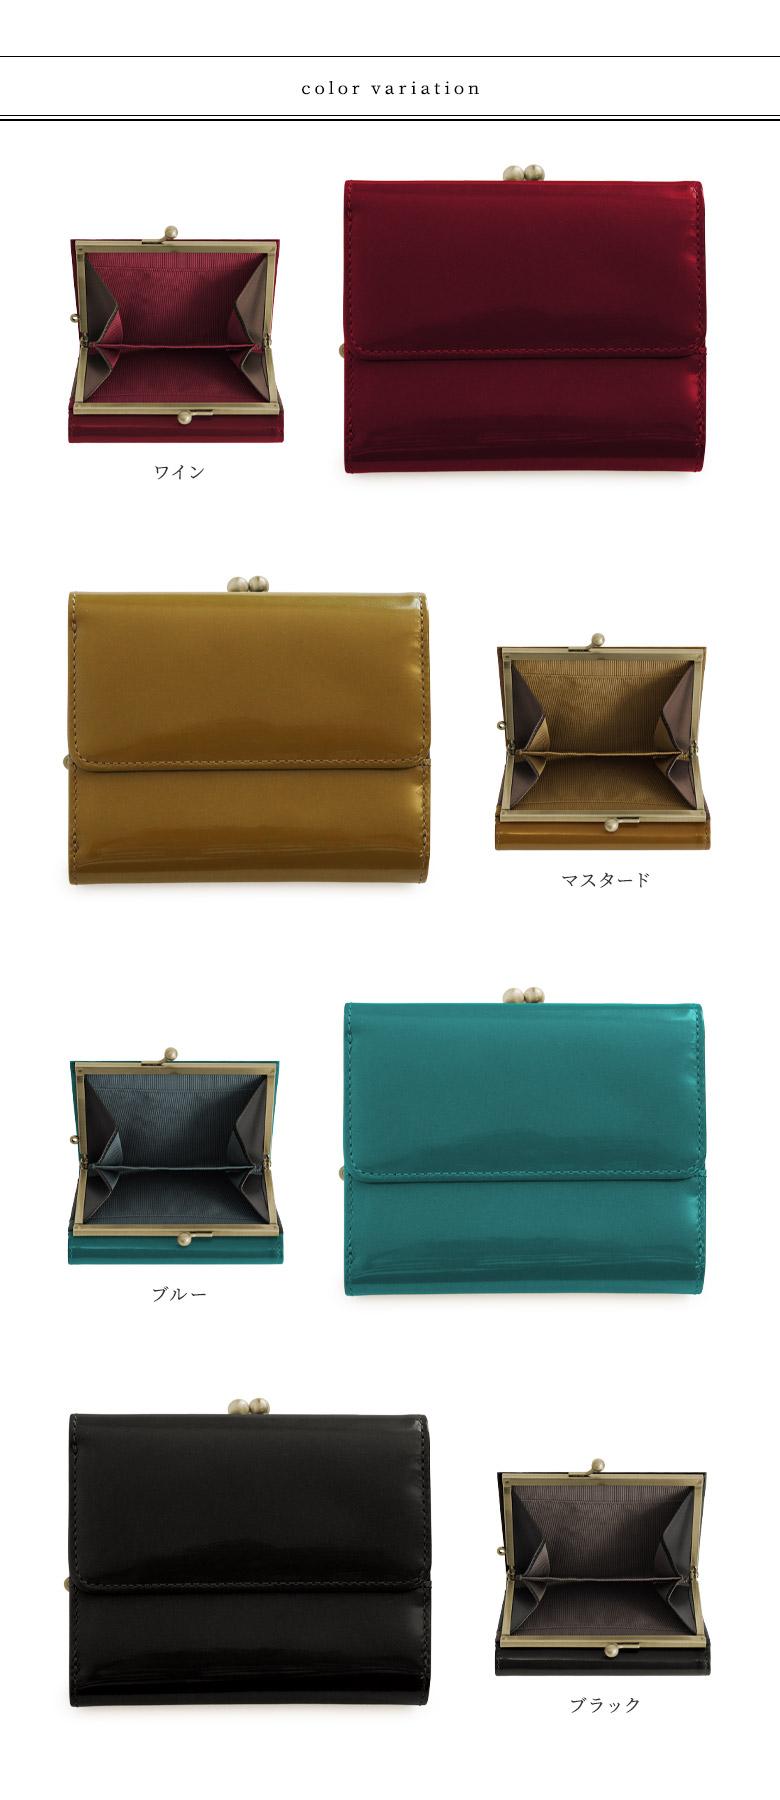 AYANOKOJI X(あやの小路 イックス) 折りたたみがま口財布 メタリックエナメル(本革) 色展開 カラーバリエーション画像